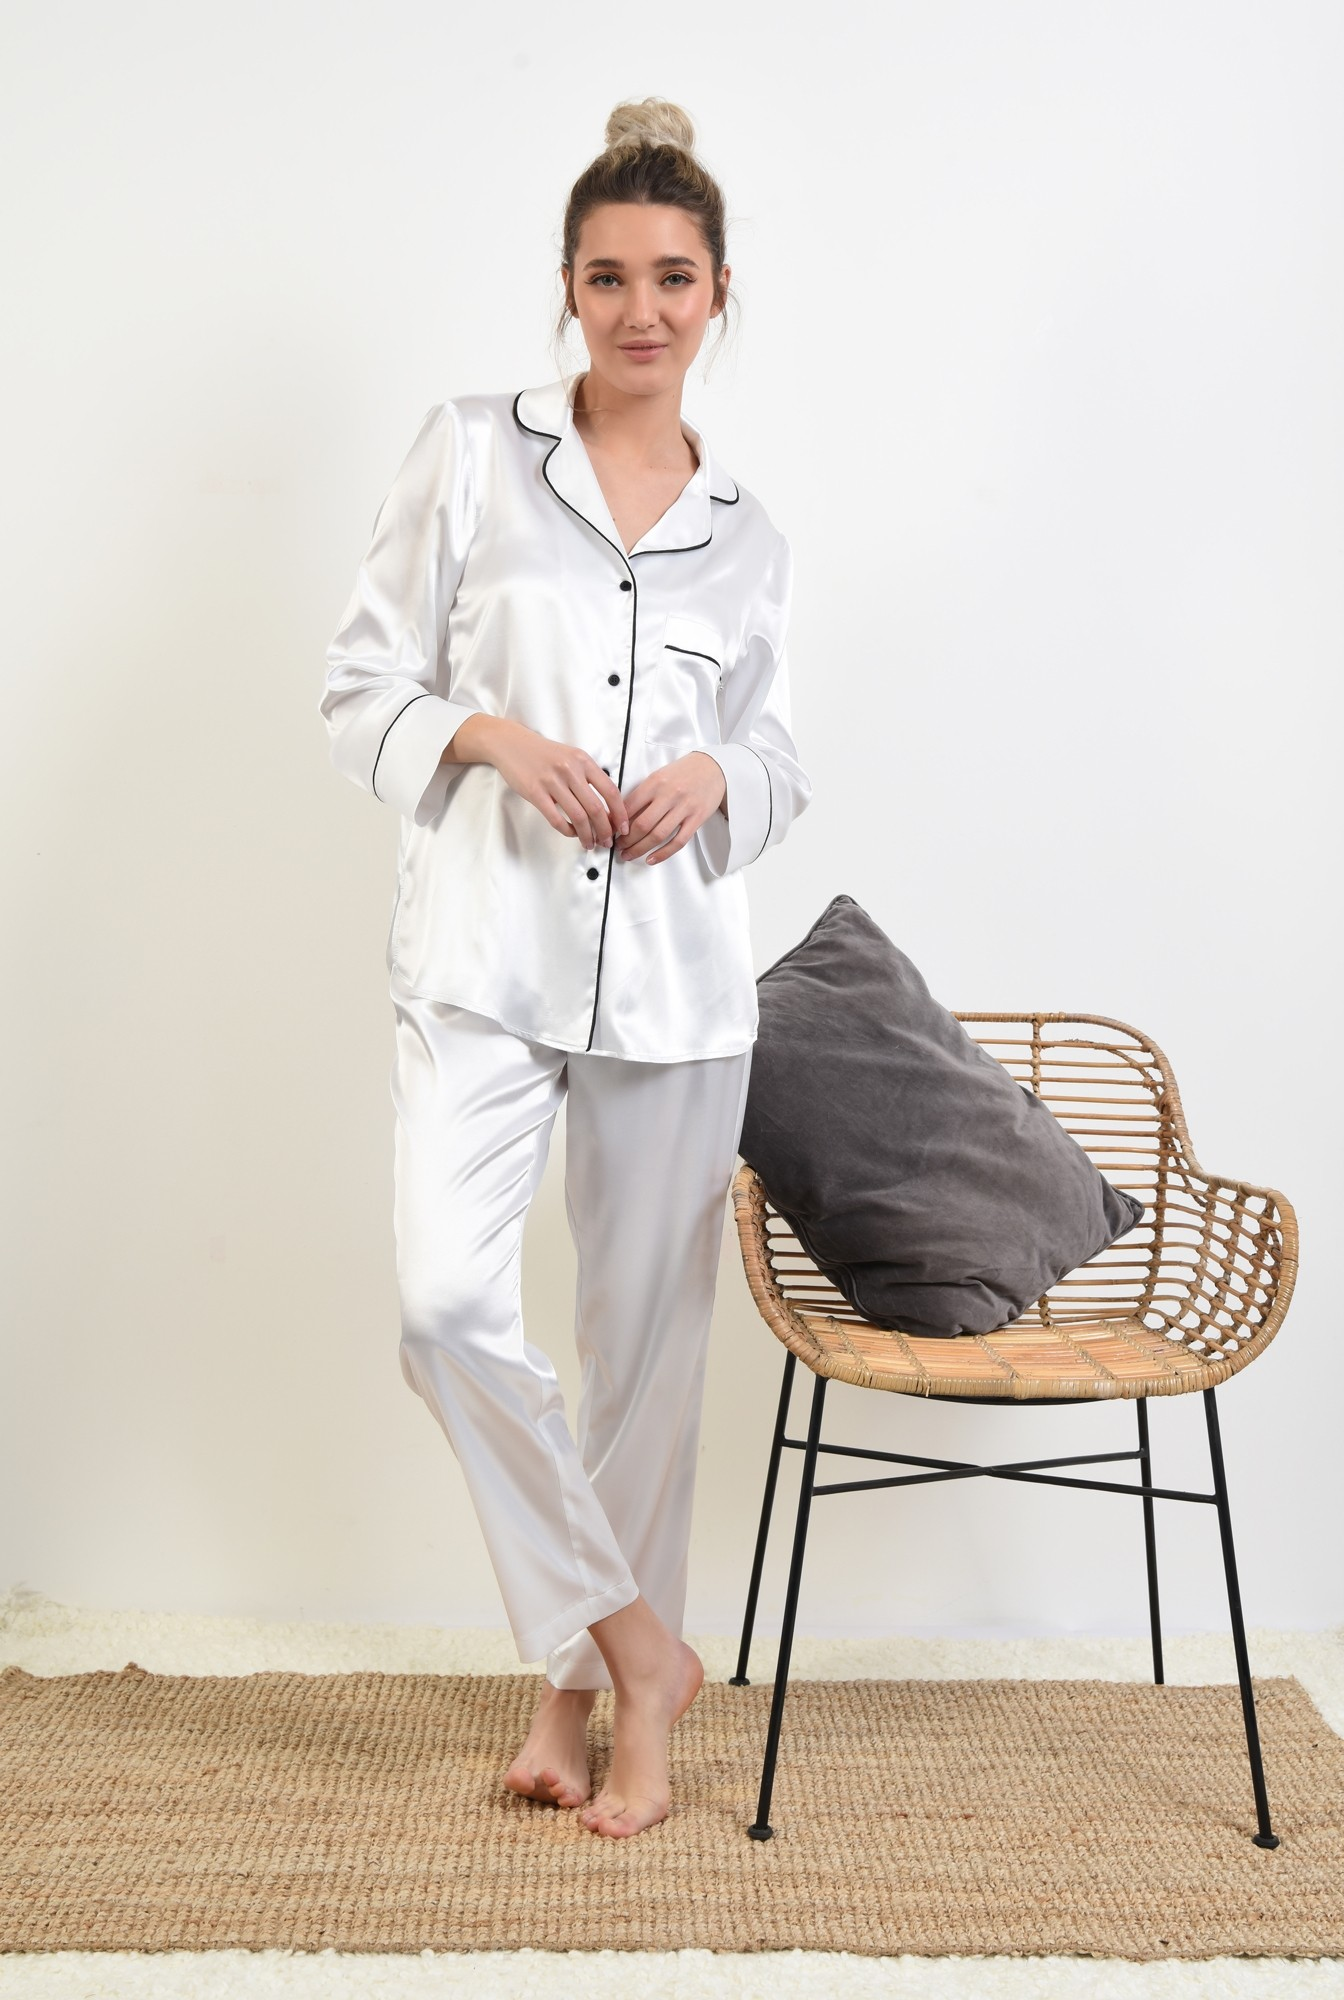 0 - pantaloni din satin, albi, lungi, cu funda in contrast